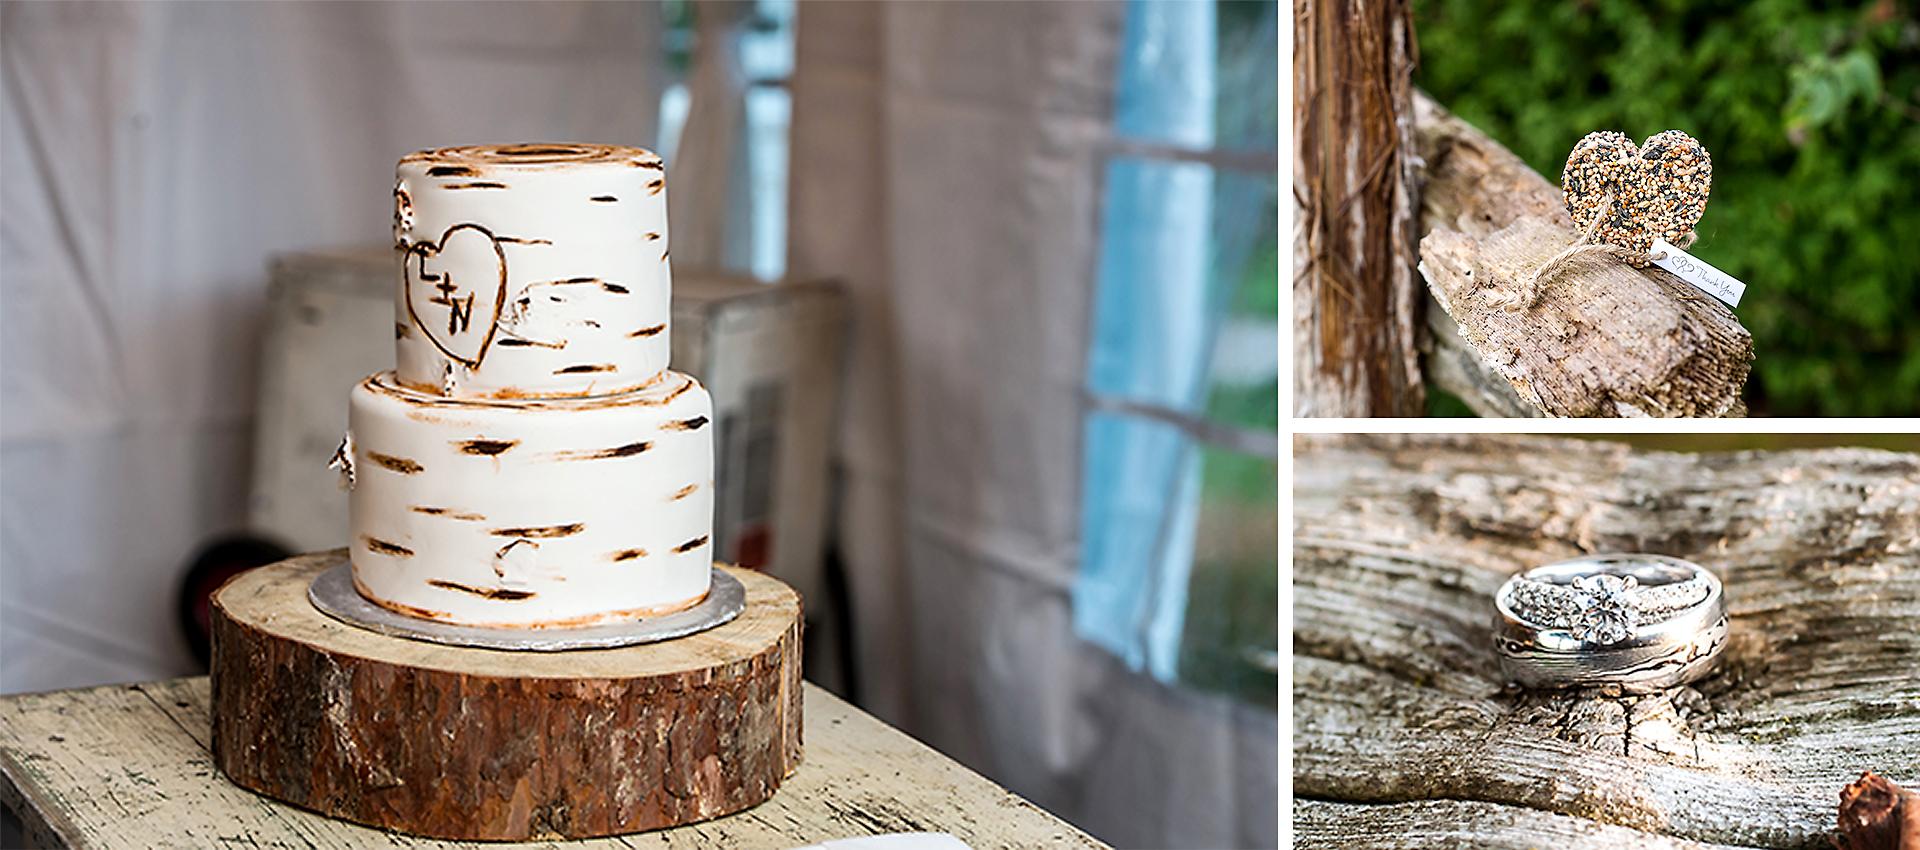 Nathan & Linda | Brooksfield Farms Wedding | Muskoka Wedding Photography36